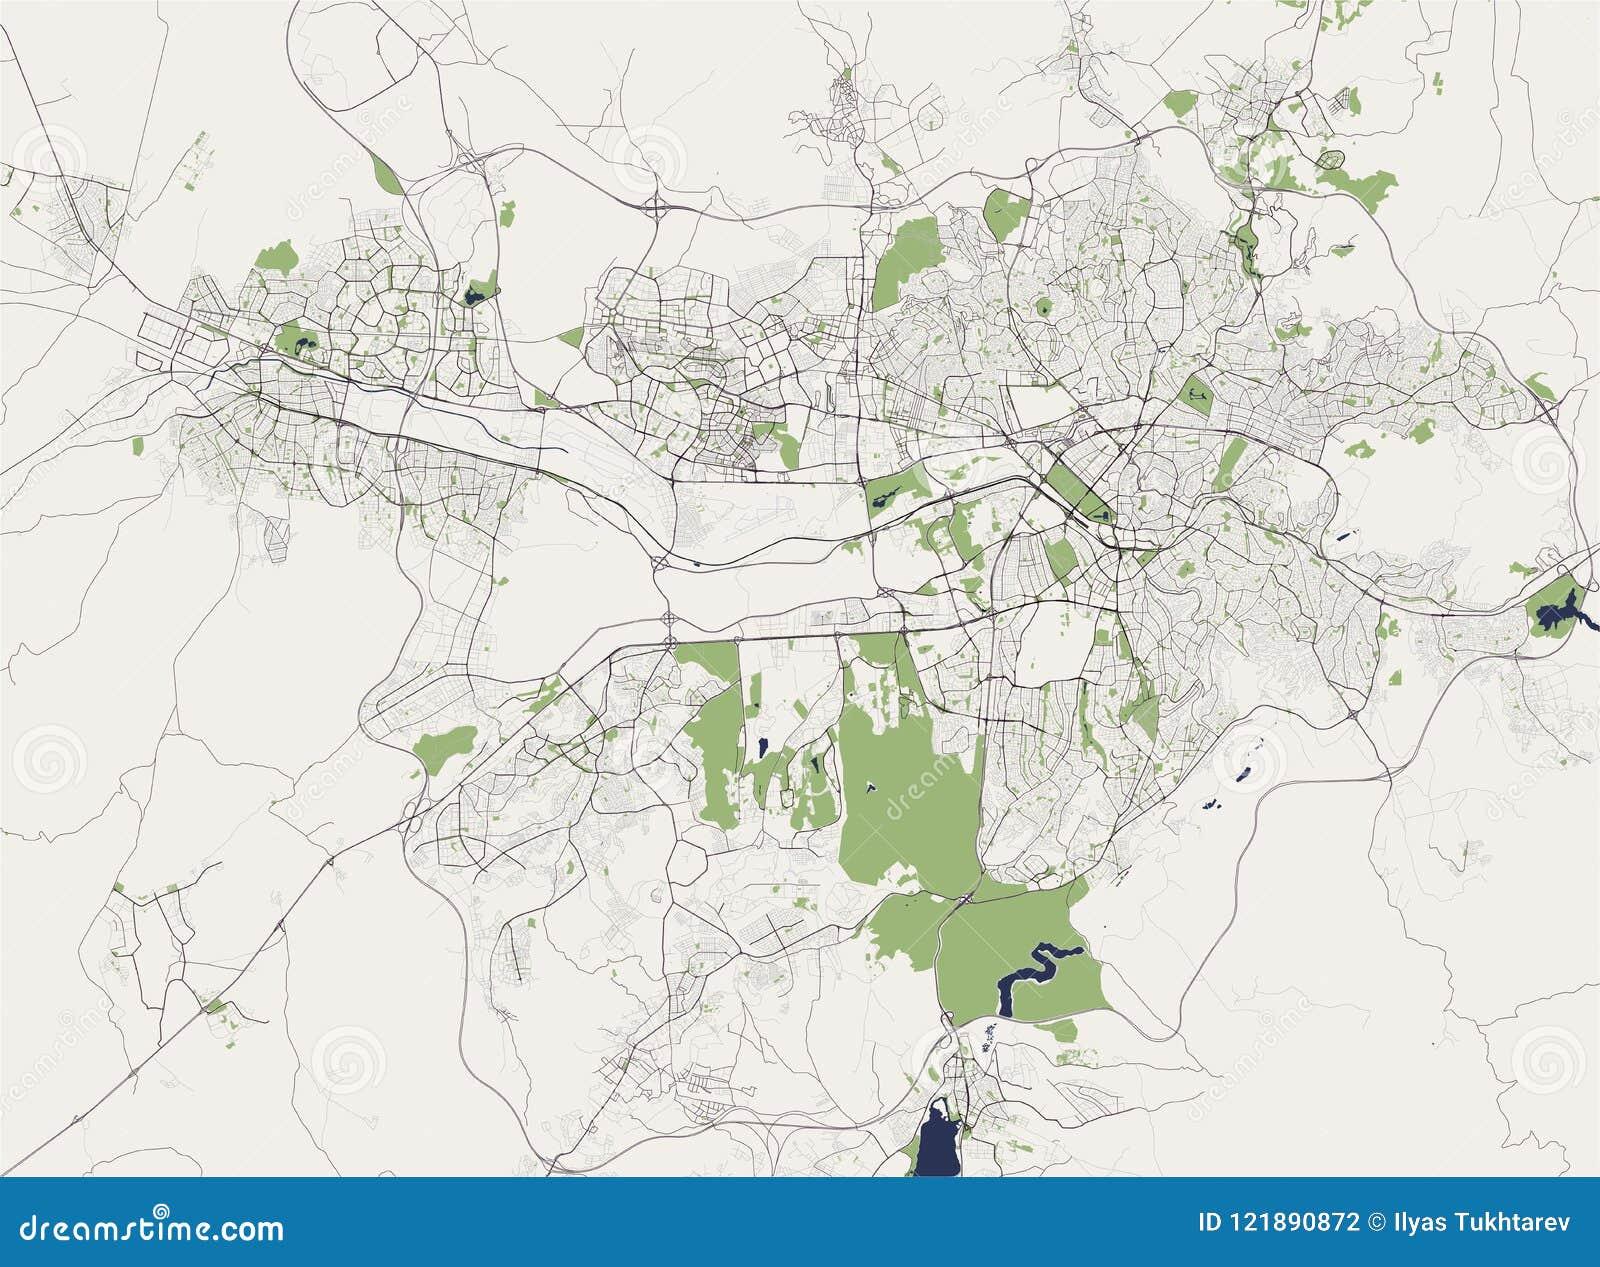 Map Of The City Of Ankara, Turkey Stock Vector - Illustration of ...